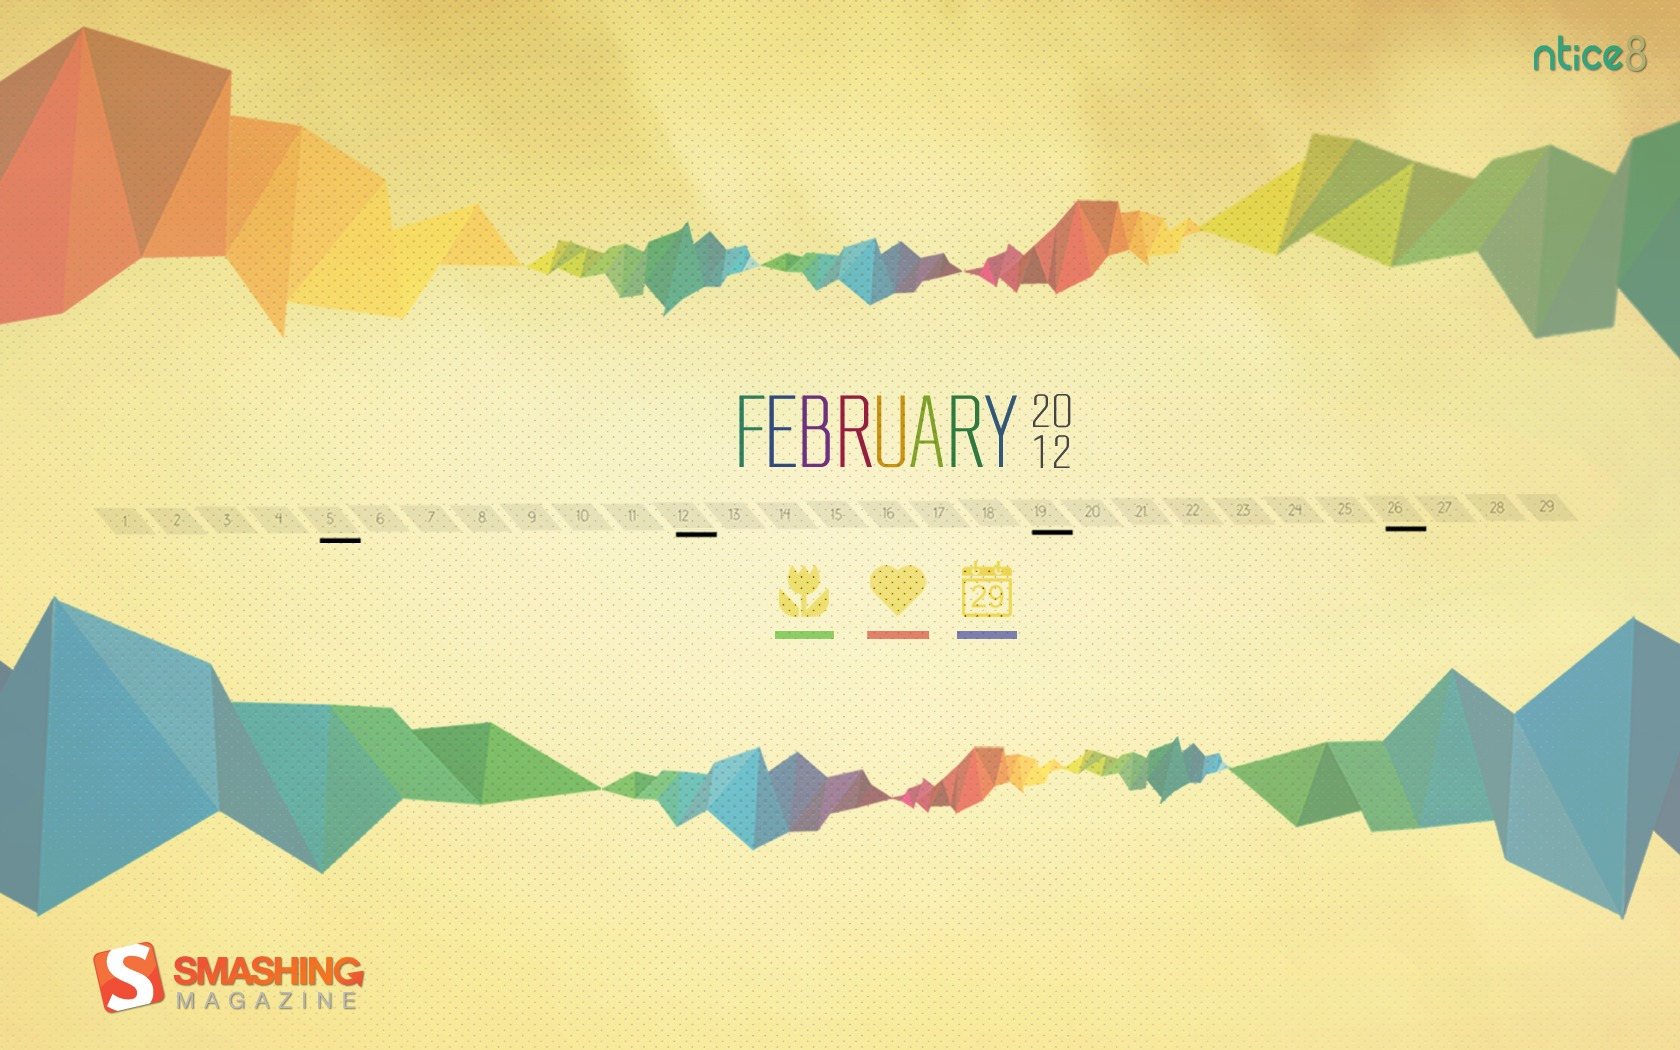 Desktop Wallpaper Calendars February 2012 Smashing Magazine 1680x1050